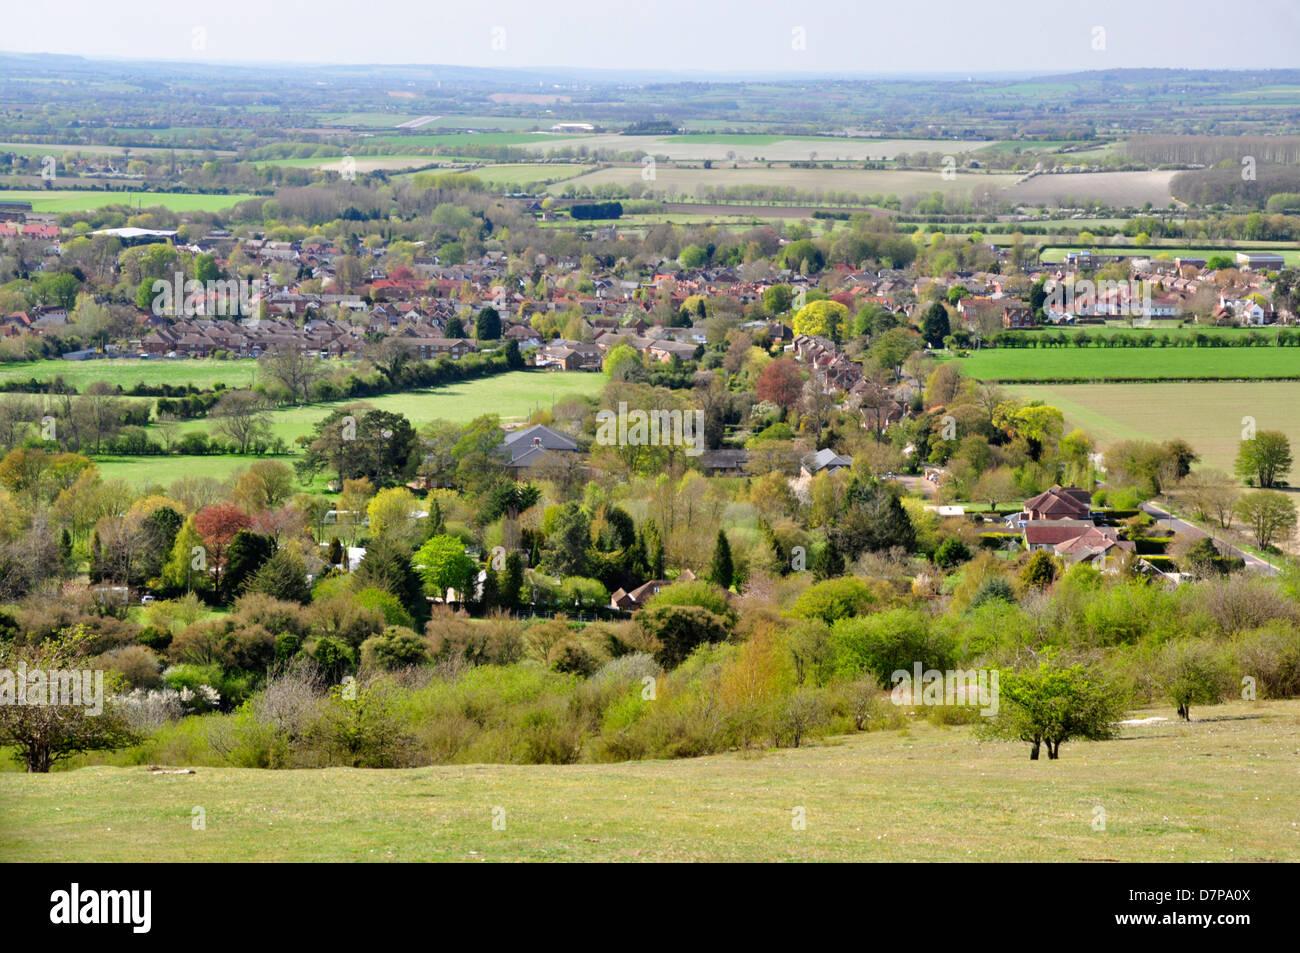 Oxon - Chiltern Hills - Watlington Hill - view over the ancient market town of Watlington - spring sunlight - Stock Image